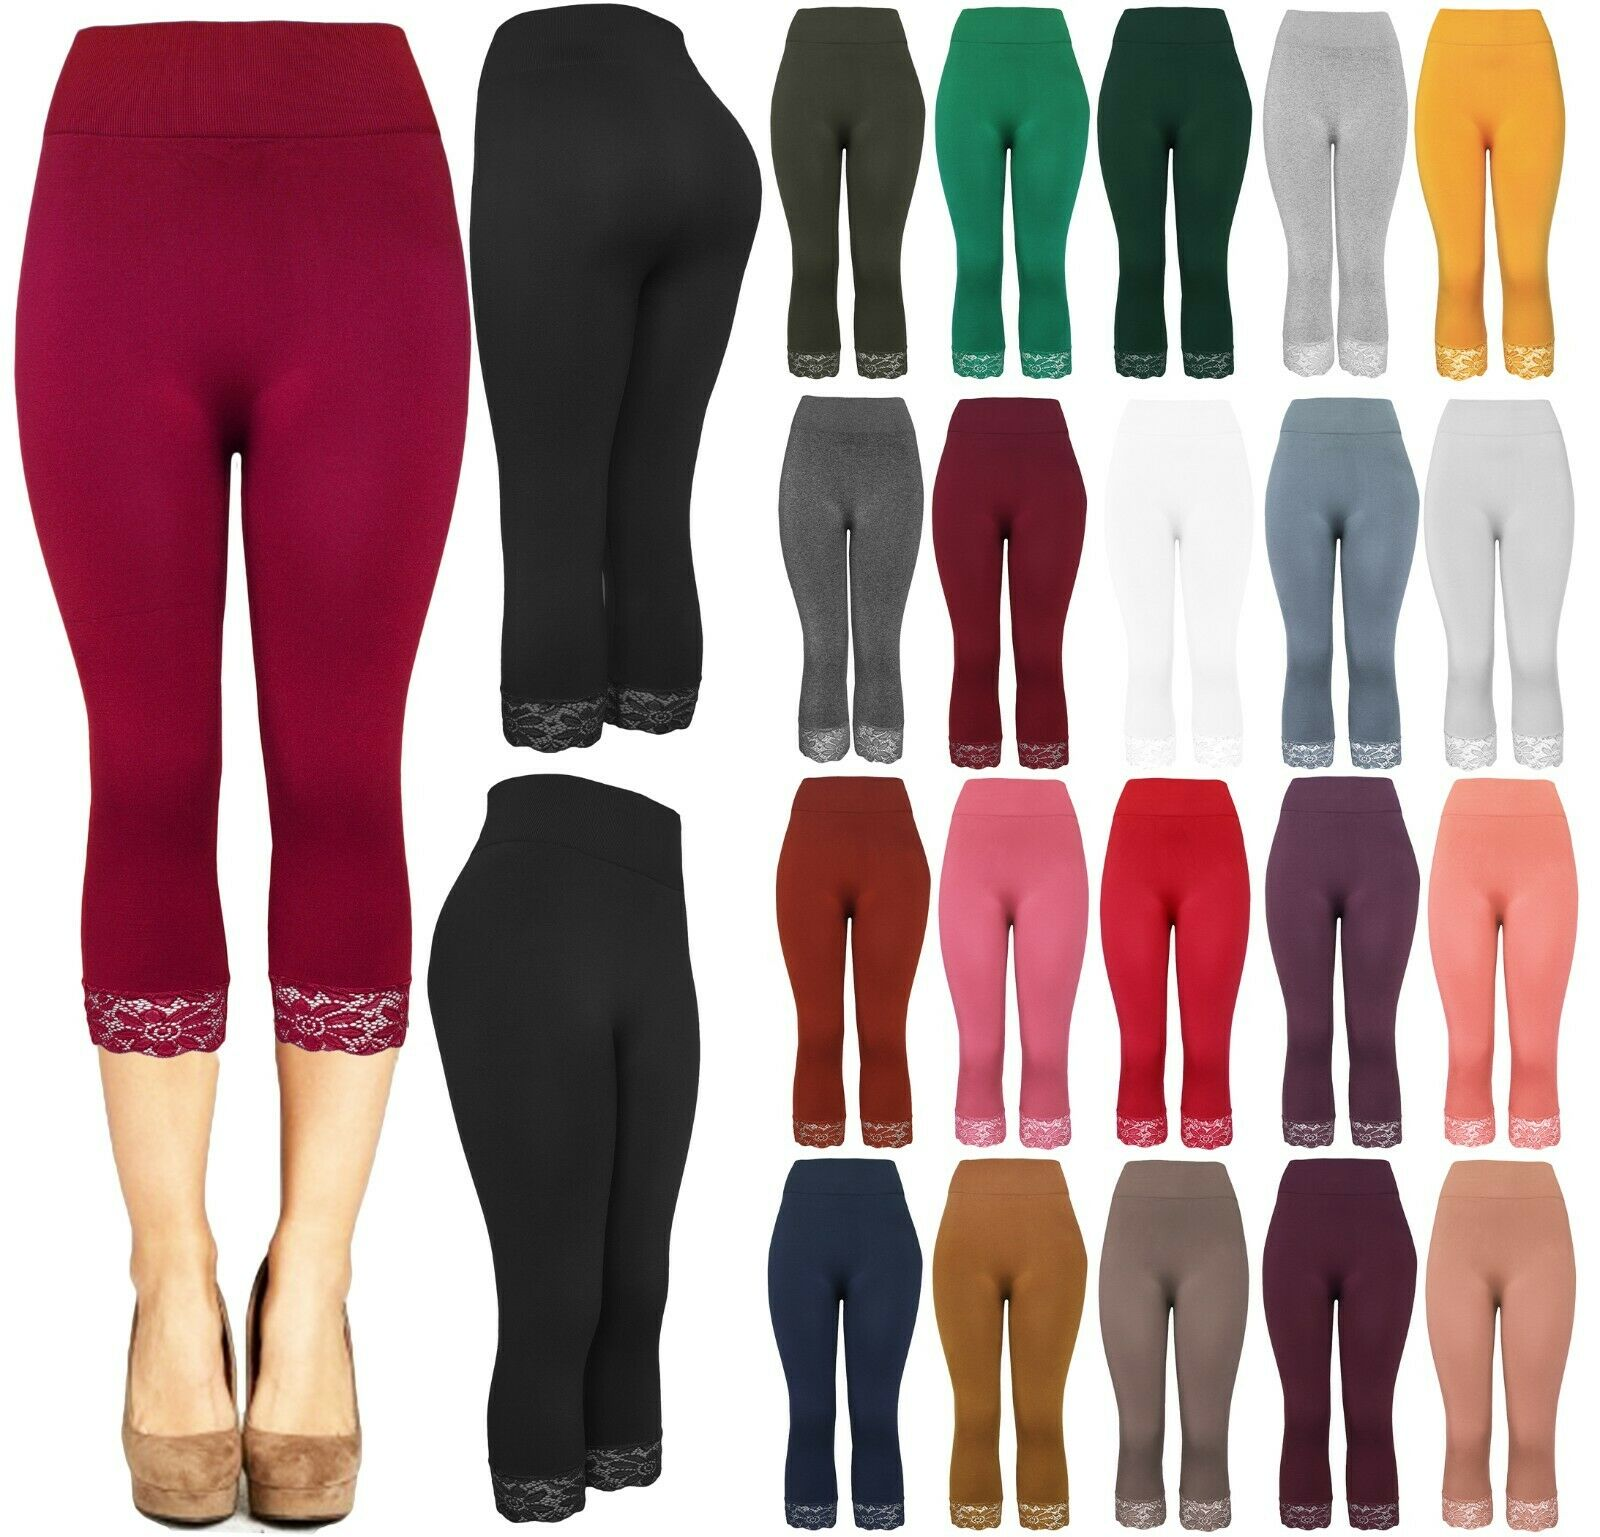 Womens Seamless S-3XL Lace Trim Capri Leggings Clothing, Shoes & Accessories